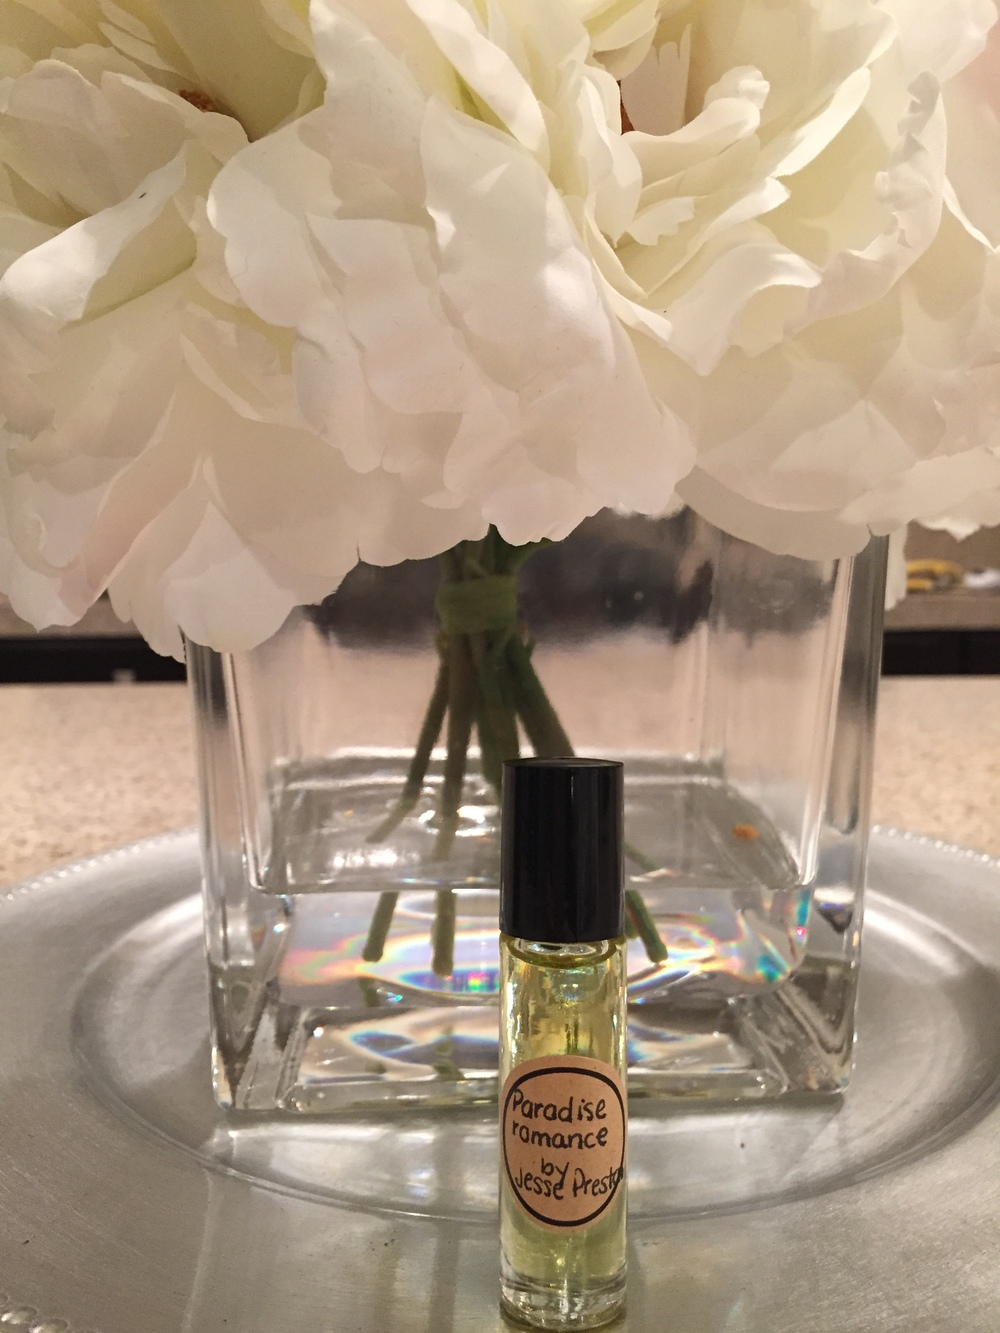 Handmade perfume oils